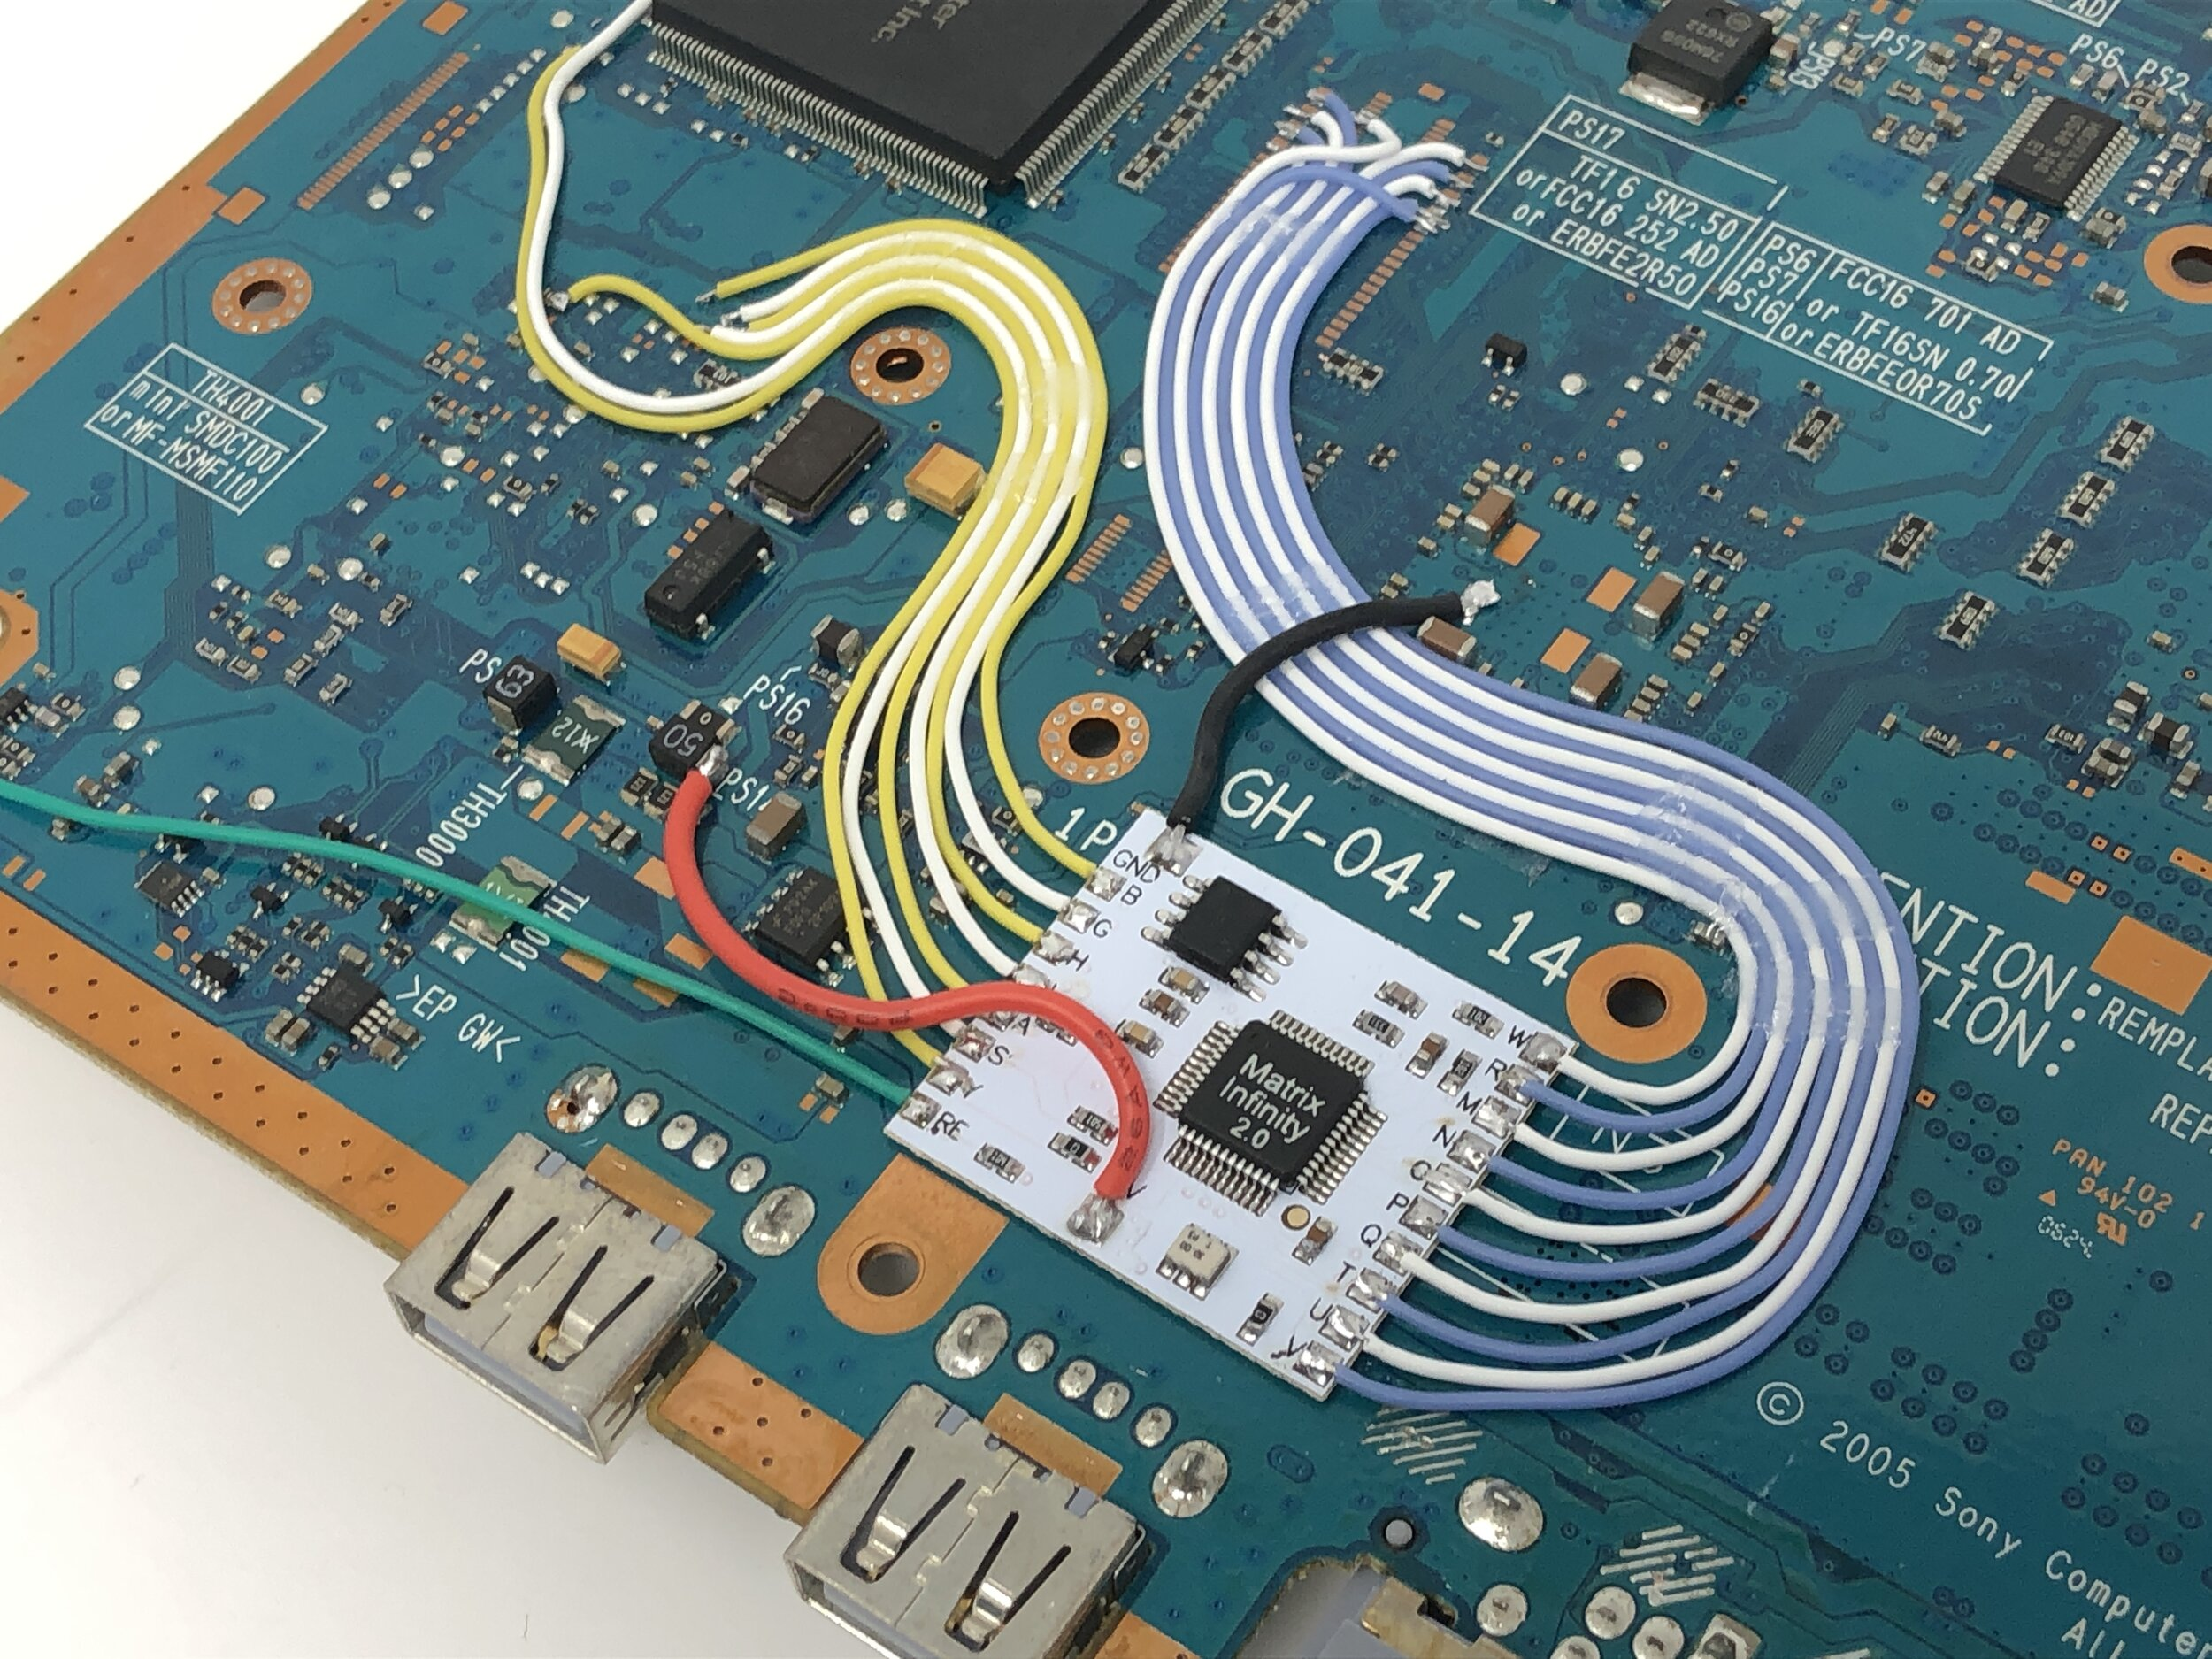 Ps2 mod chip reset